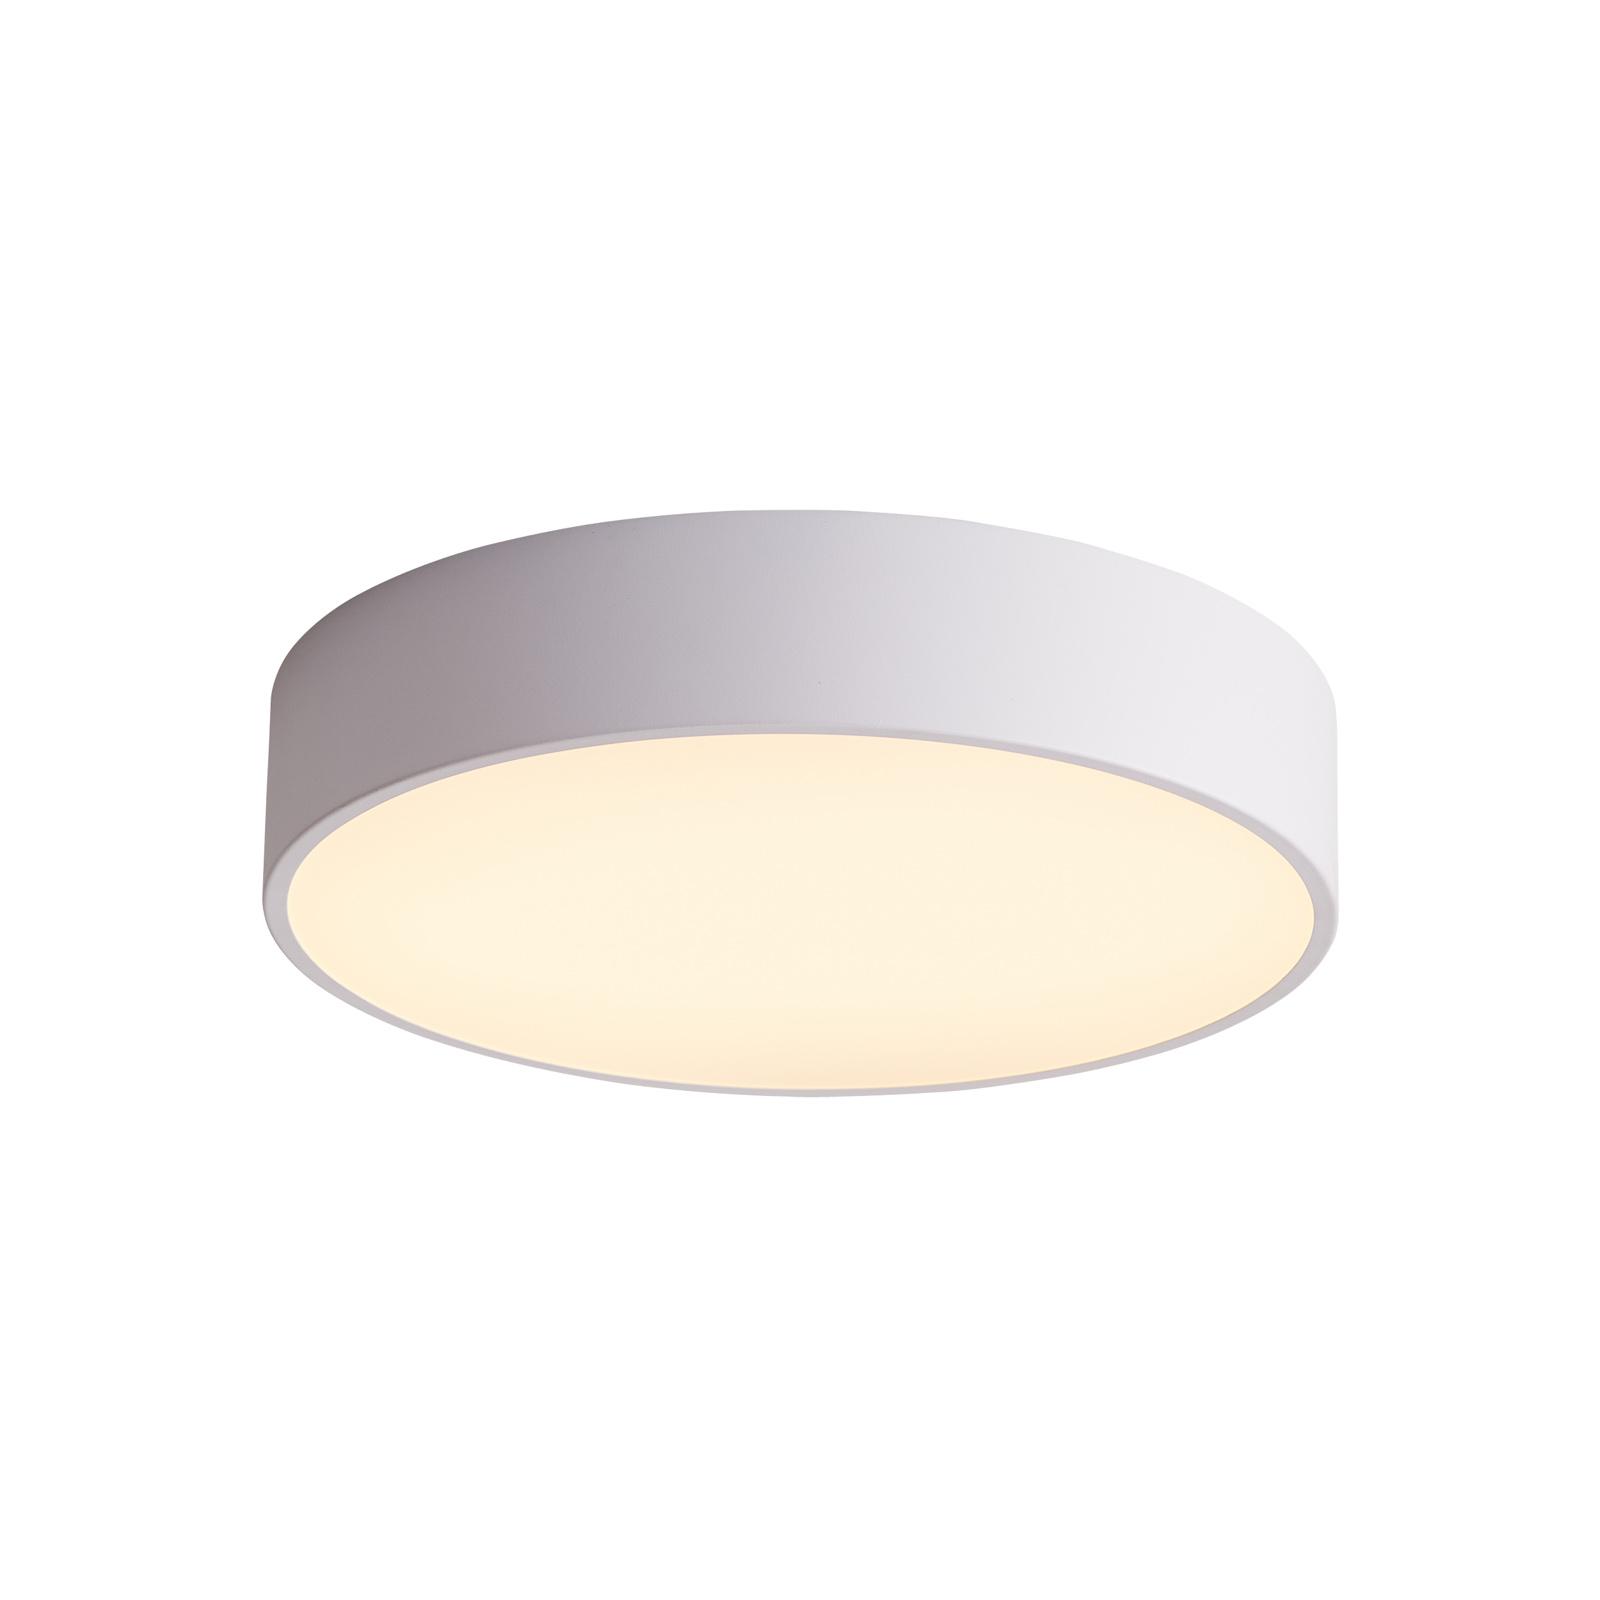 Arcchio Noabelle LED-taklampe, hvit, 80 cm